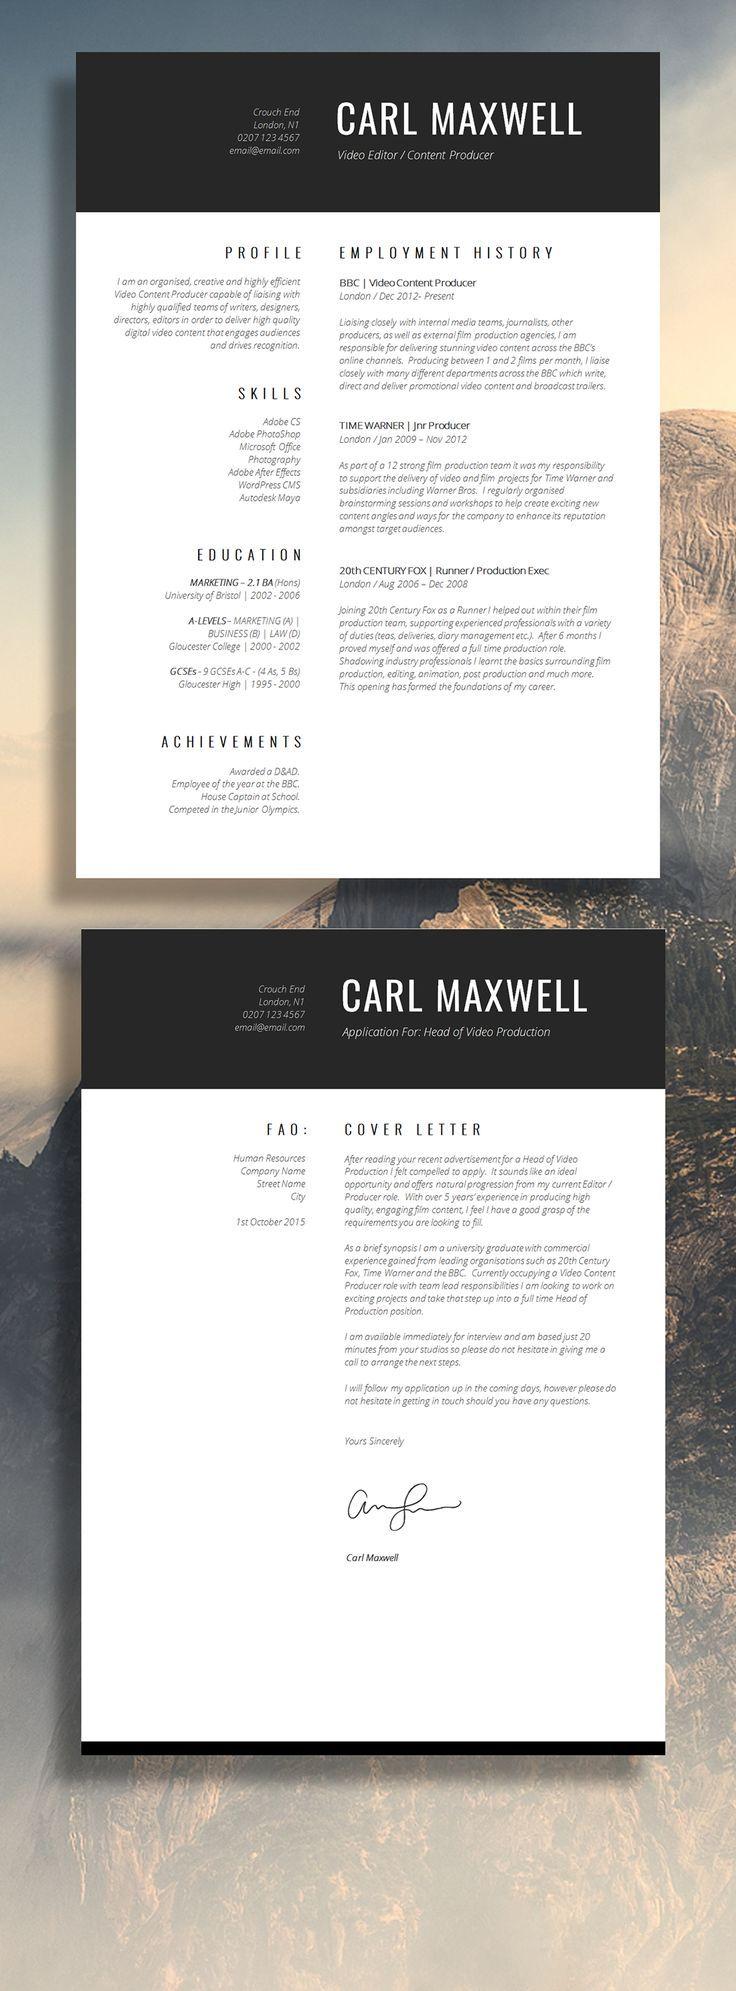 Professional Resume Template CV Template Resume Advice